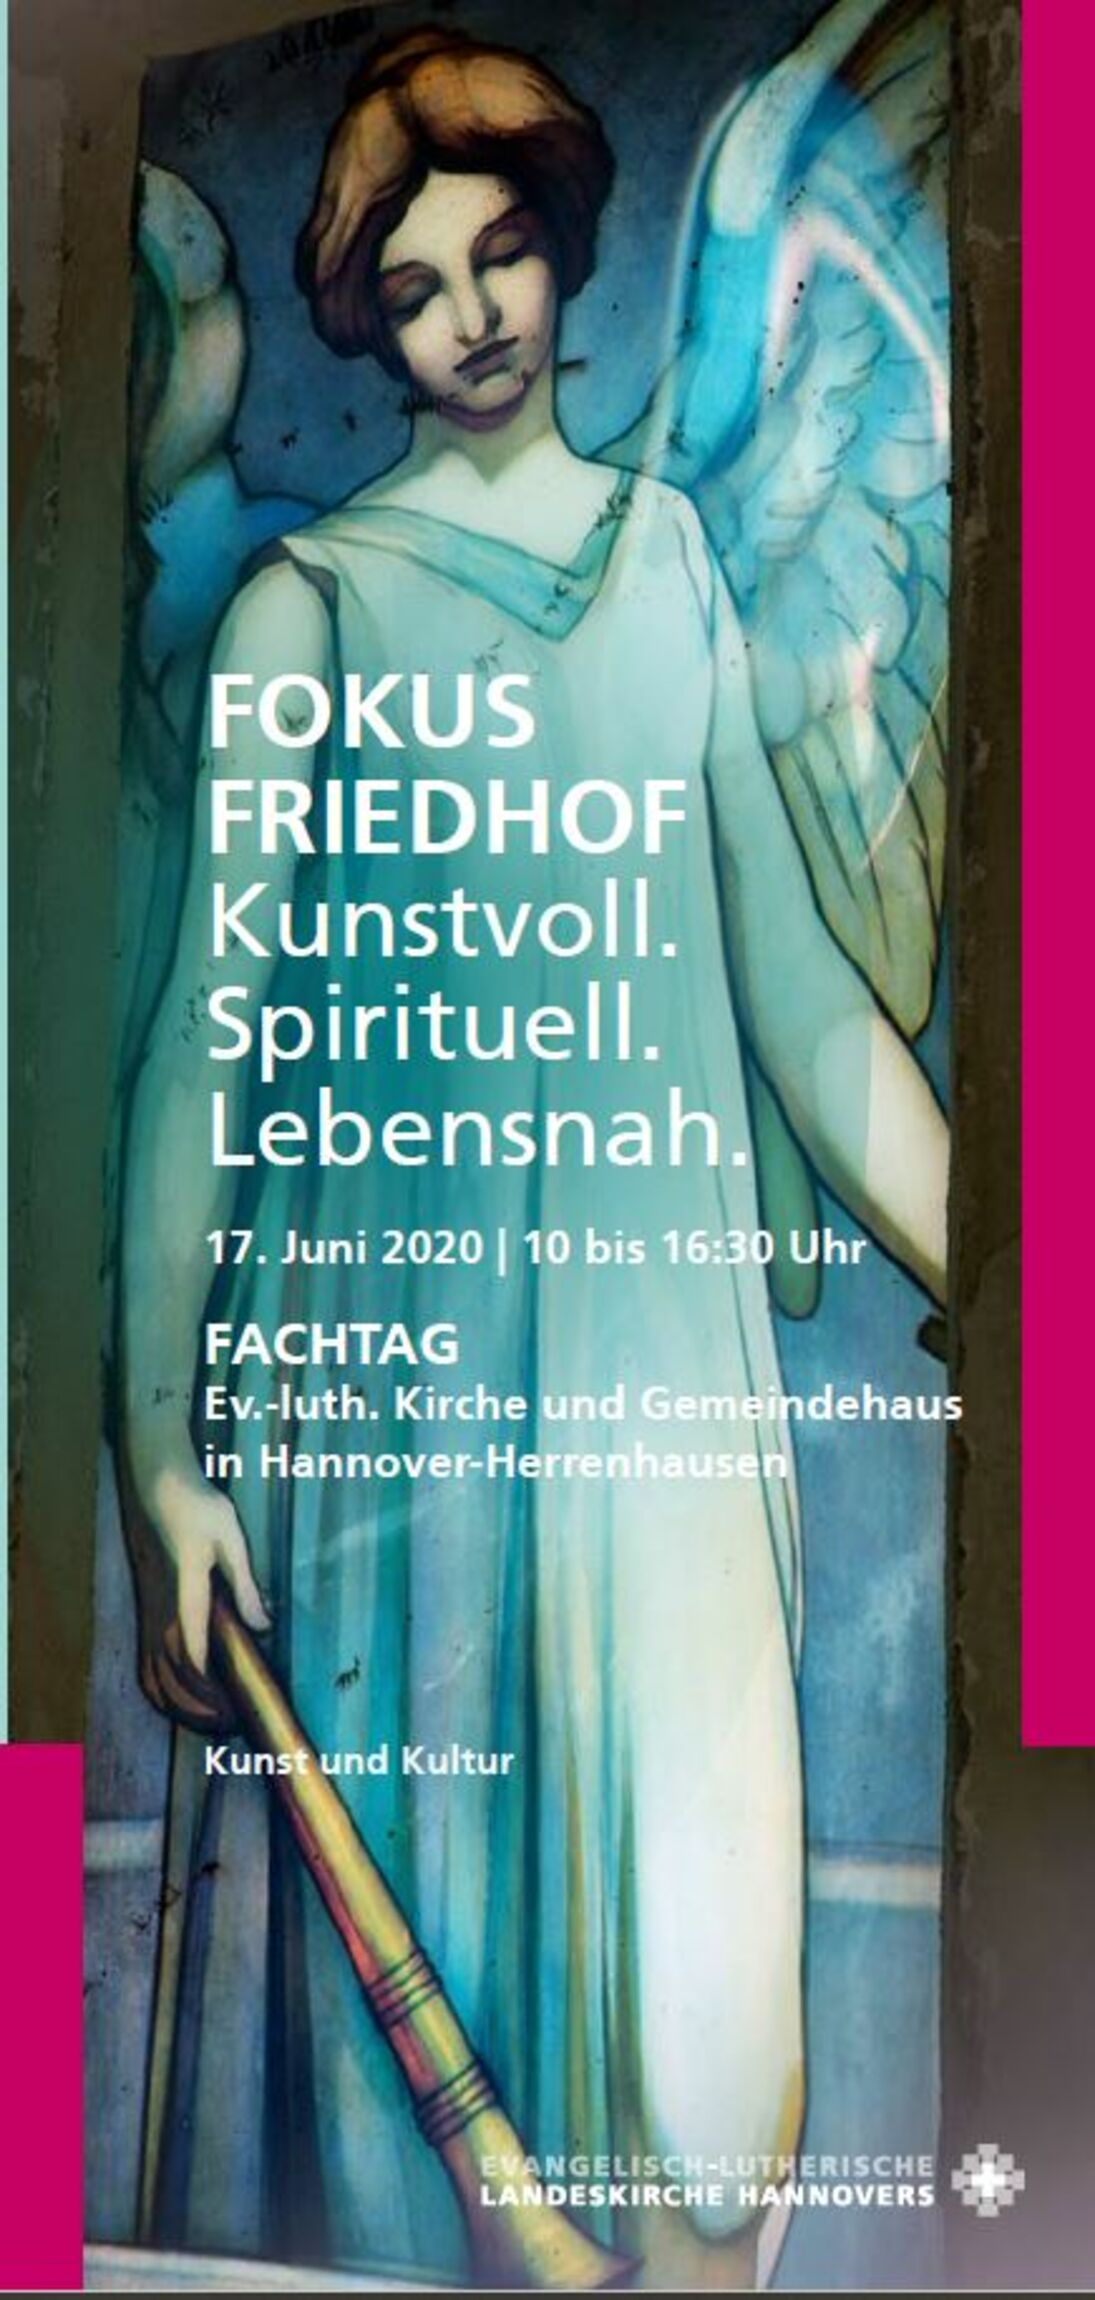 2020-fachtag-friedhof-flyer-1.spalte